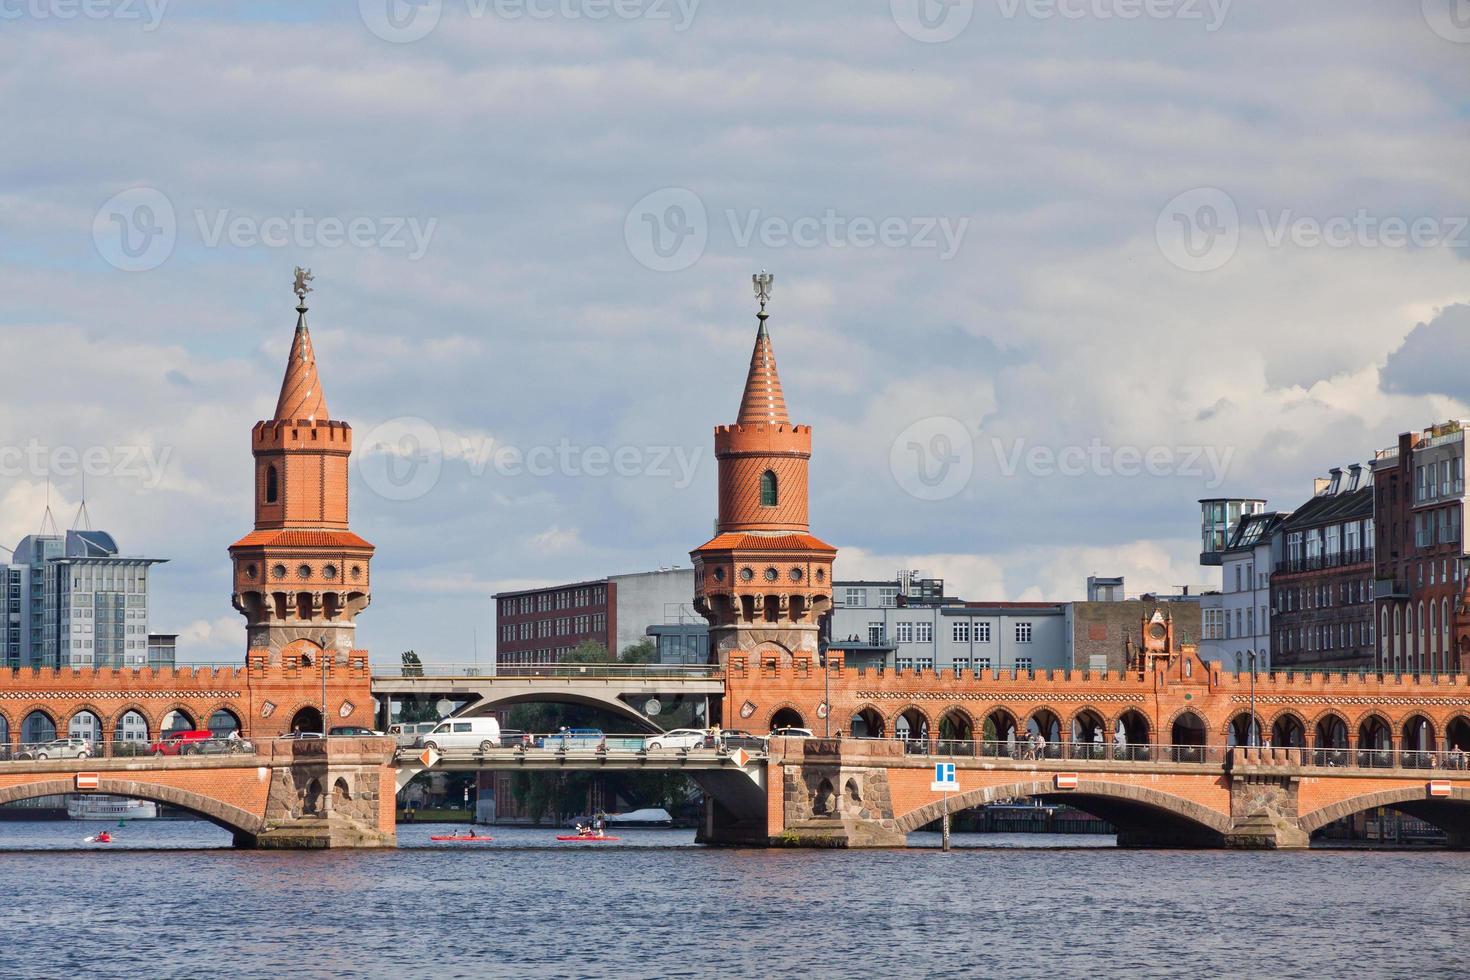 ponte oberbaumbrucke através do rio spree em berlim foto